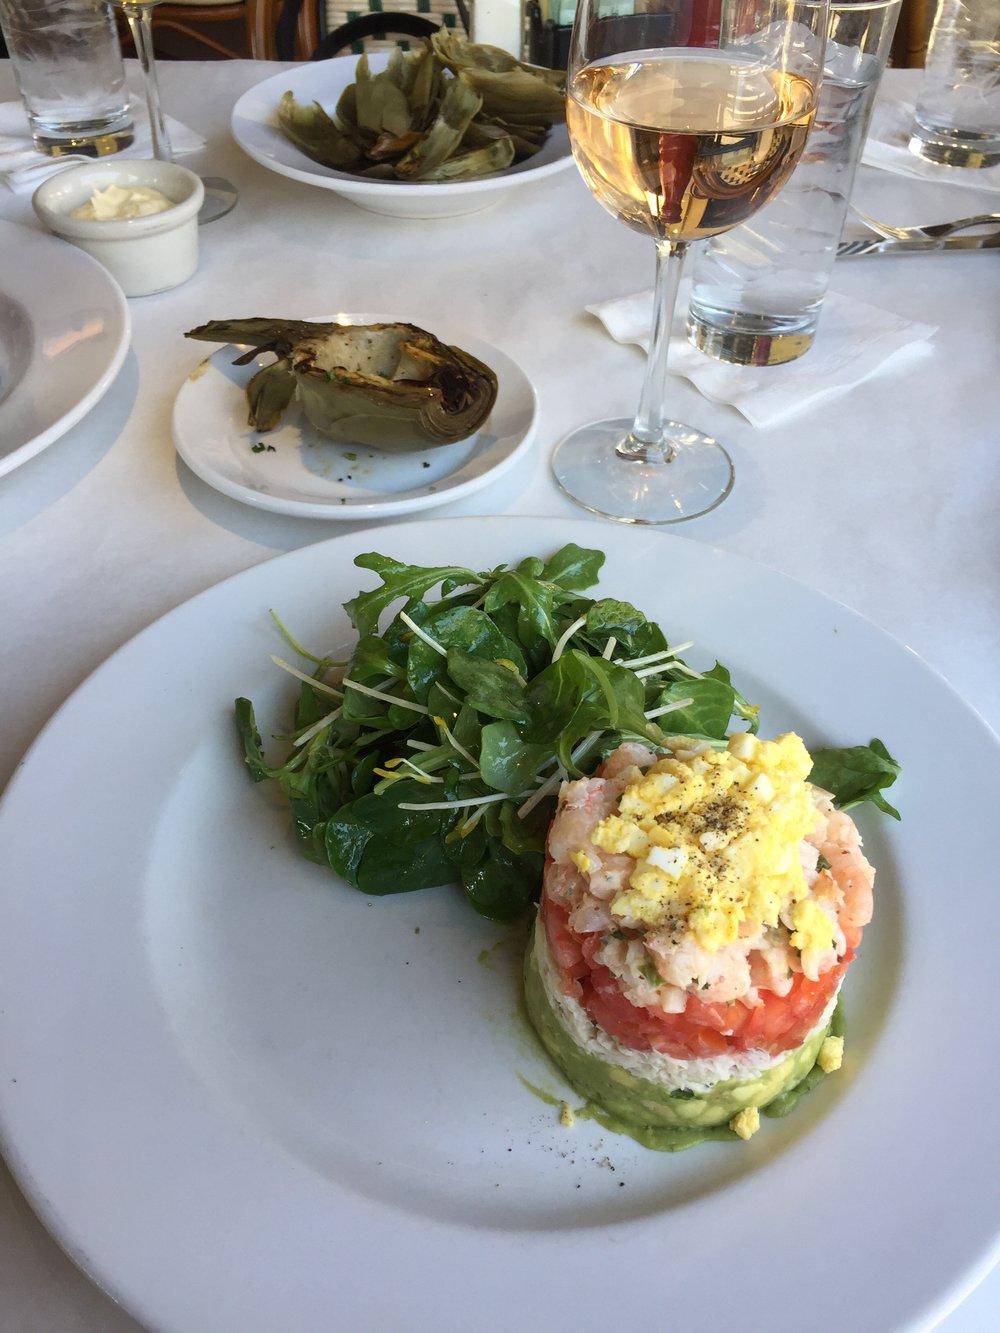 Palm-Beach-Salad-Brickstops-Charlotte-NC-lauren-schwaiger-blog.jpg